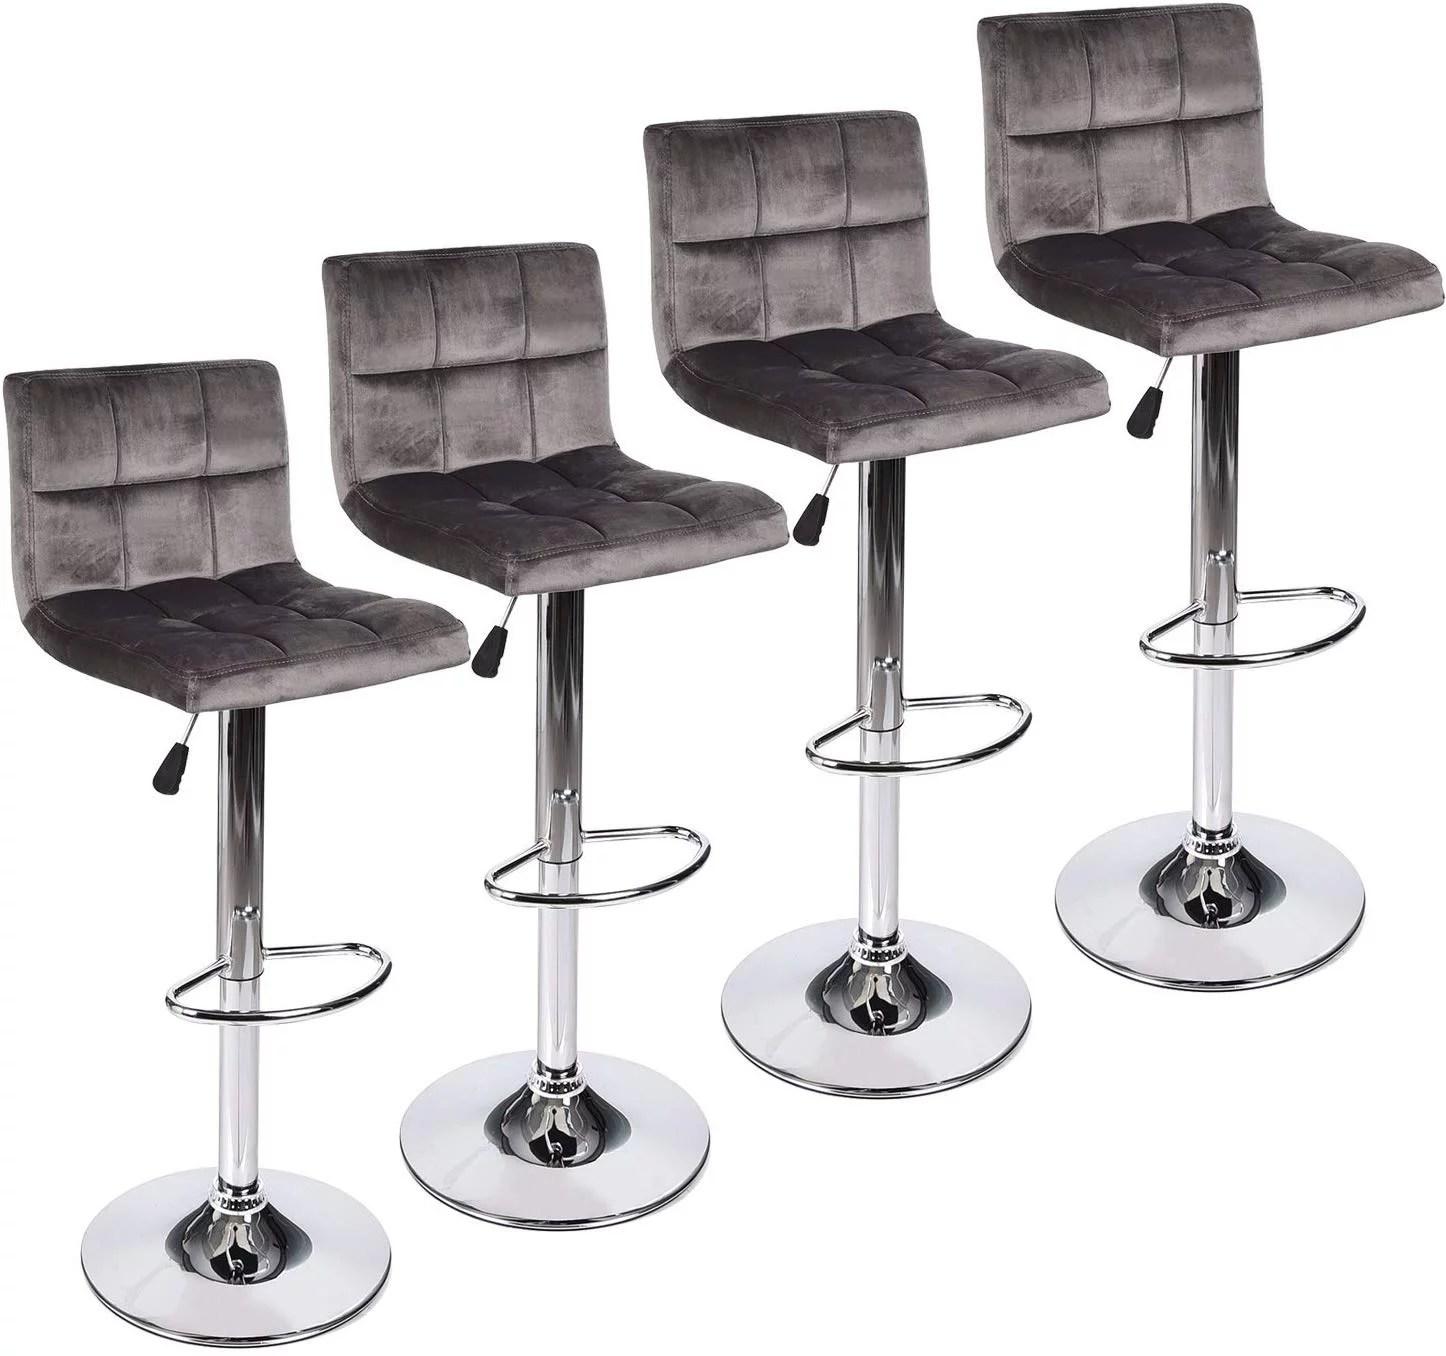 Elecwish Set Of 4 Gray Velvet Fabric Armless Chair Adjustable Swivel Hydraulic Bar Stool Square Island Kitchen Counter Barstools With Back Walmart Com Walmart Com